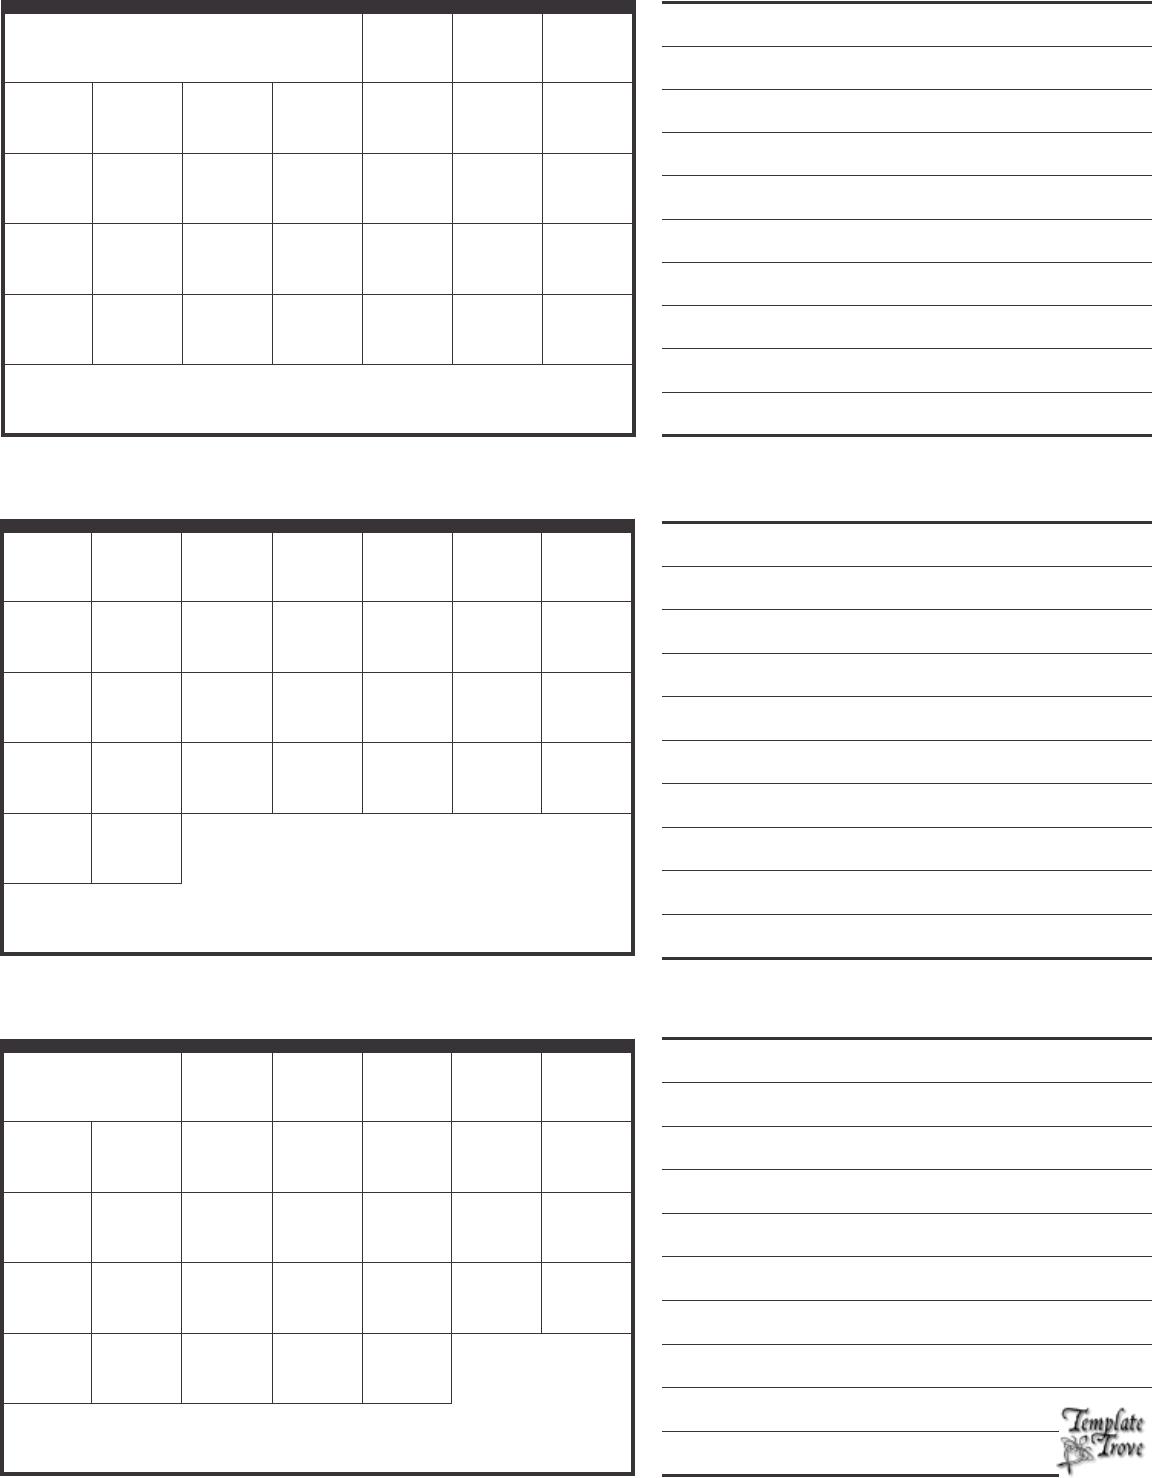 3 month calendar with notes bg1 Dliqwm